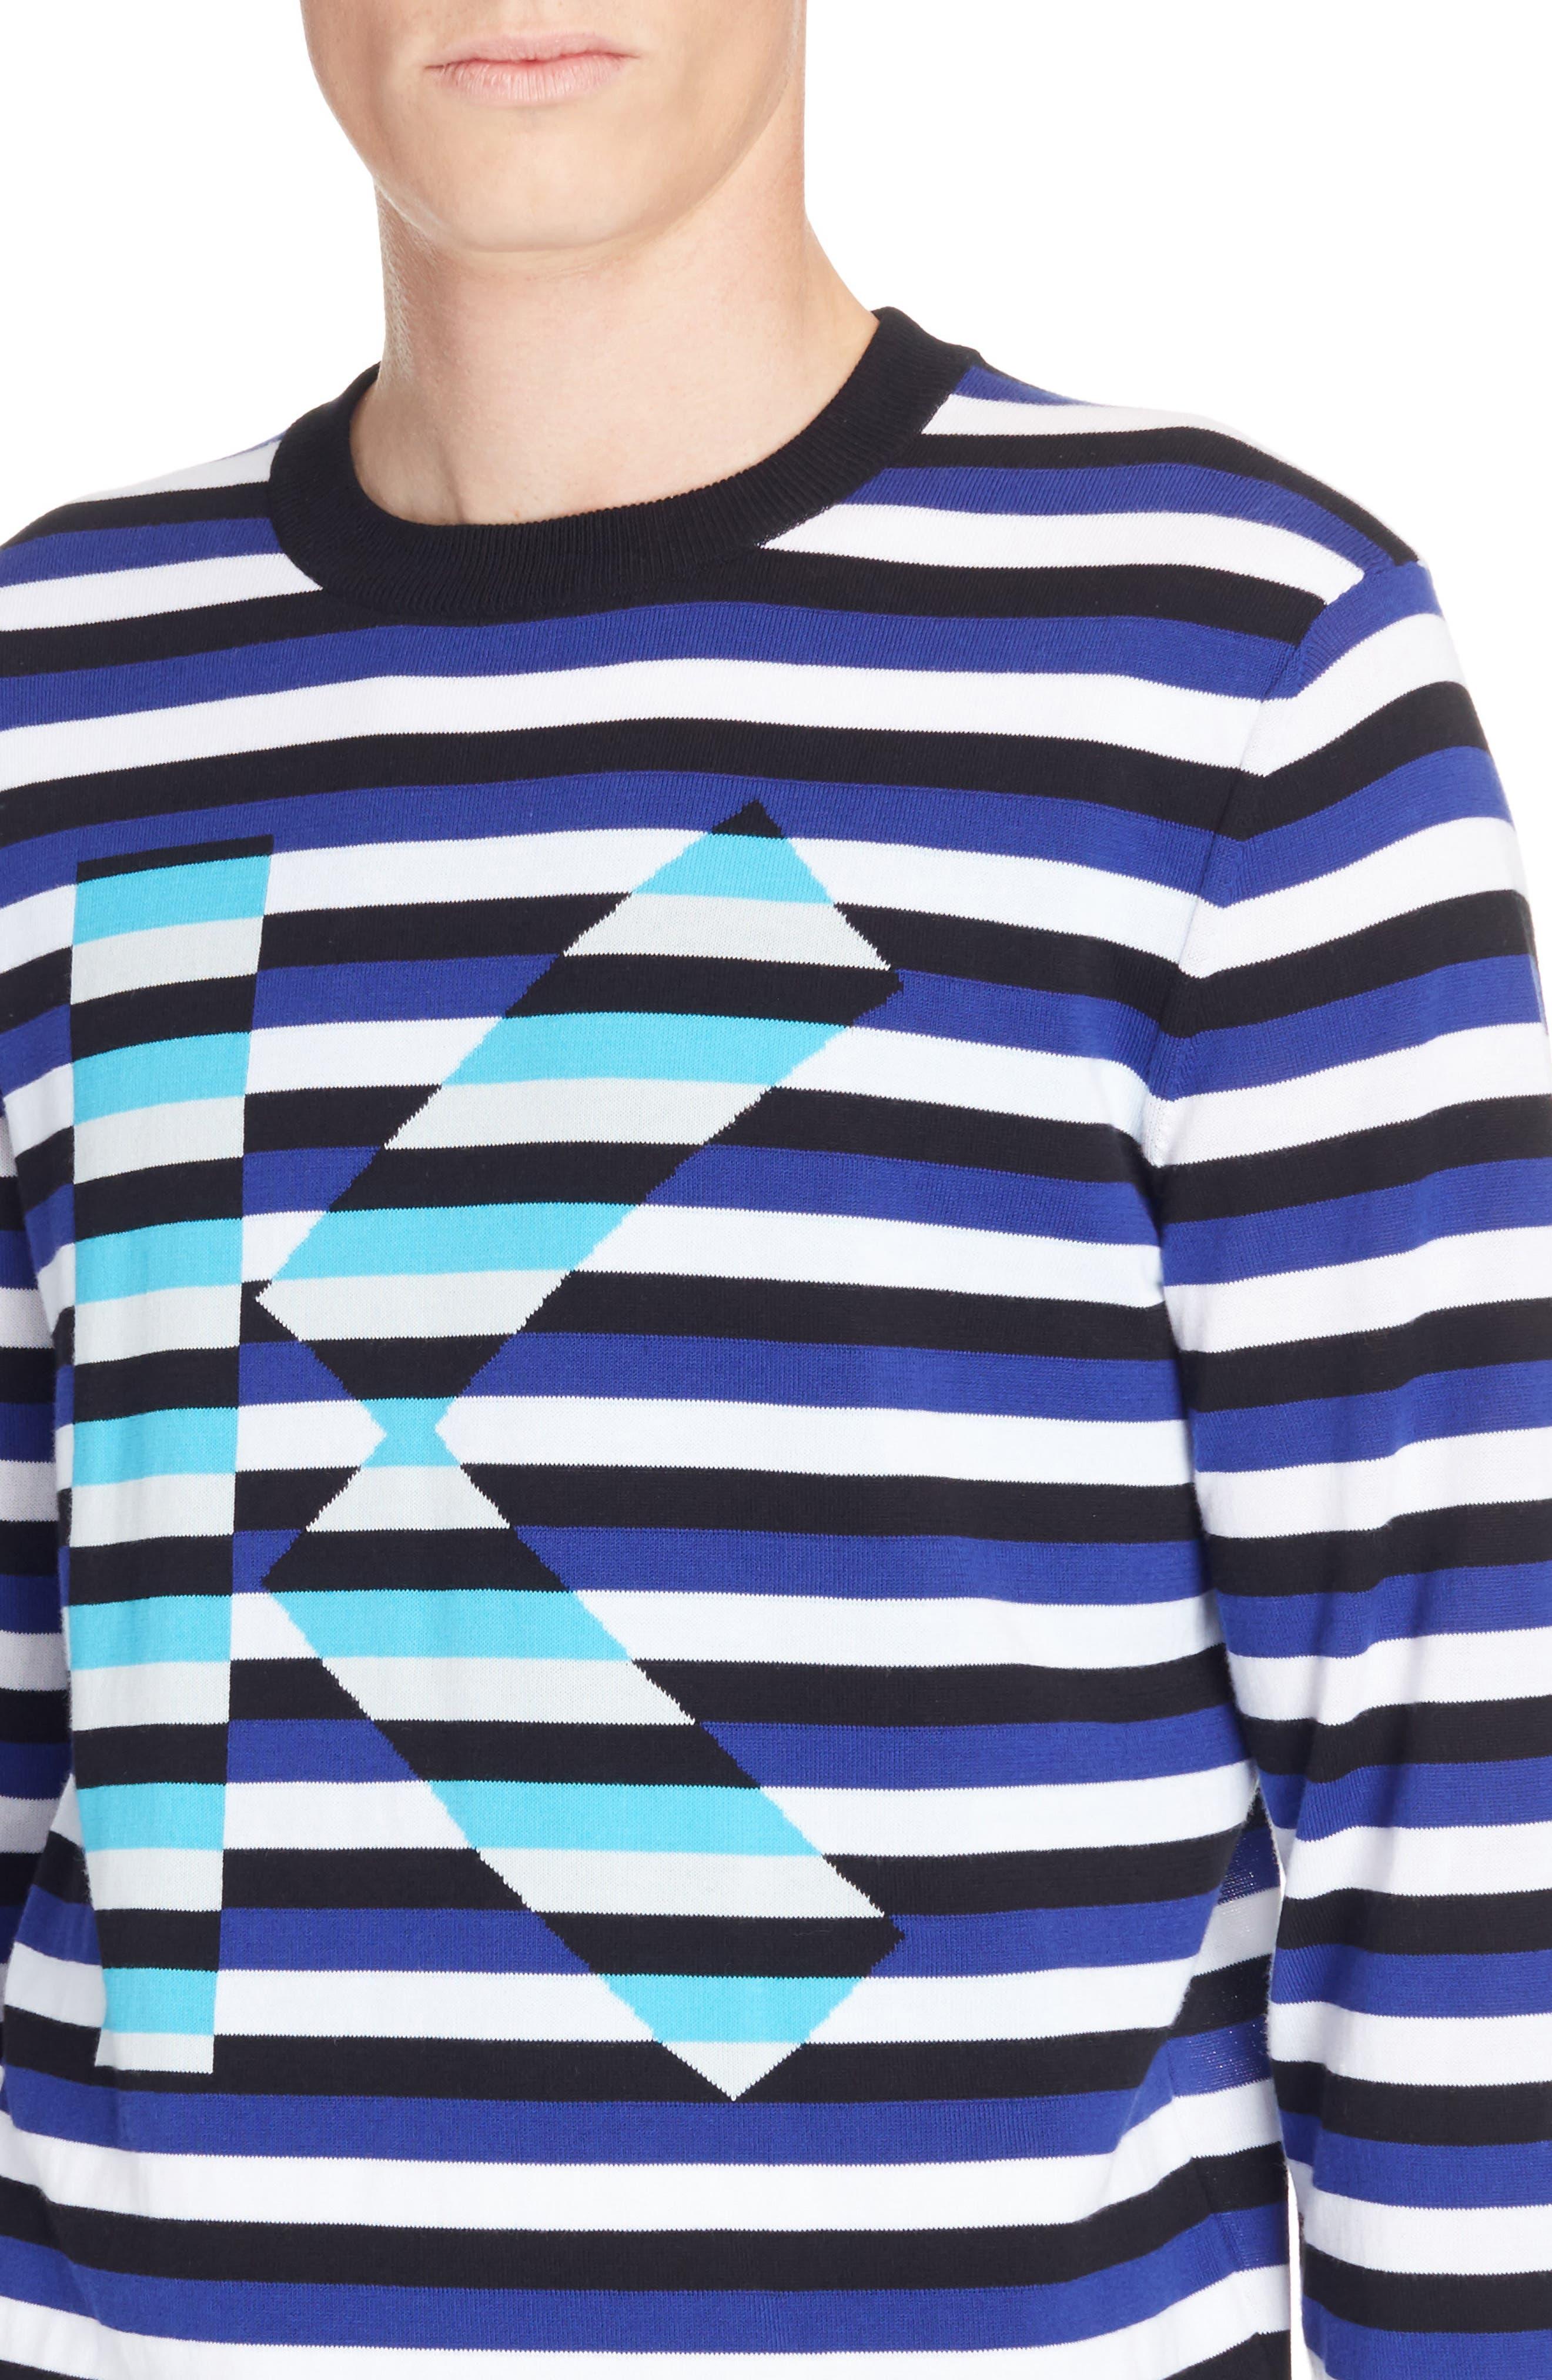 Large K Stripe Sweater,                             Alternate thumbnail 4, color,                             422